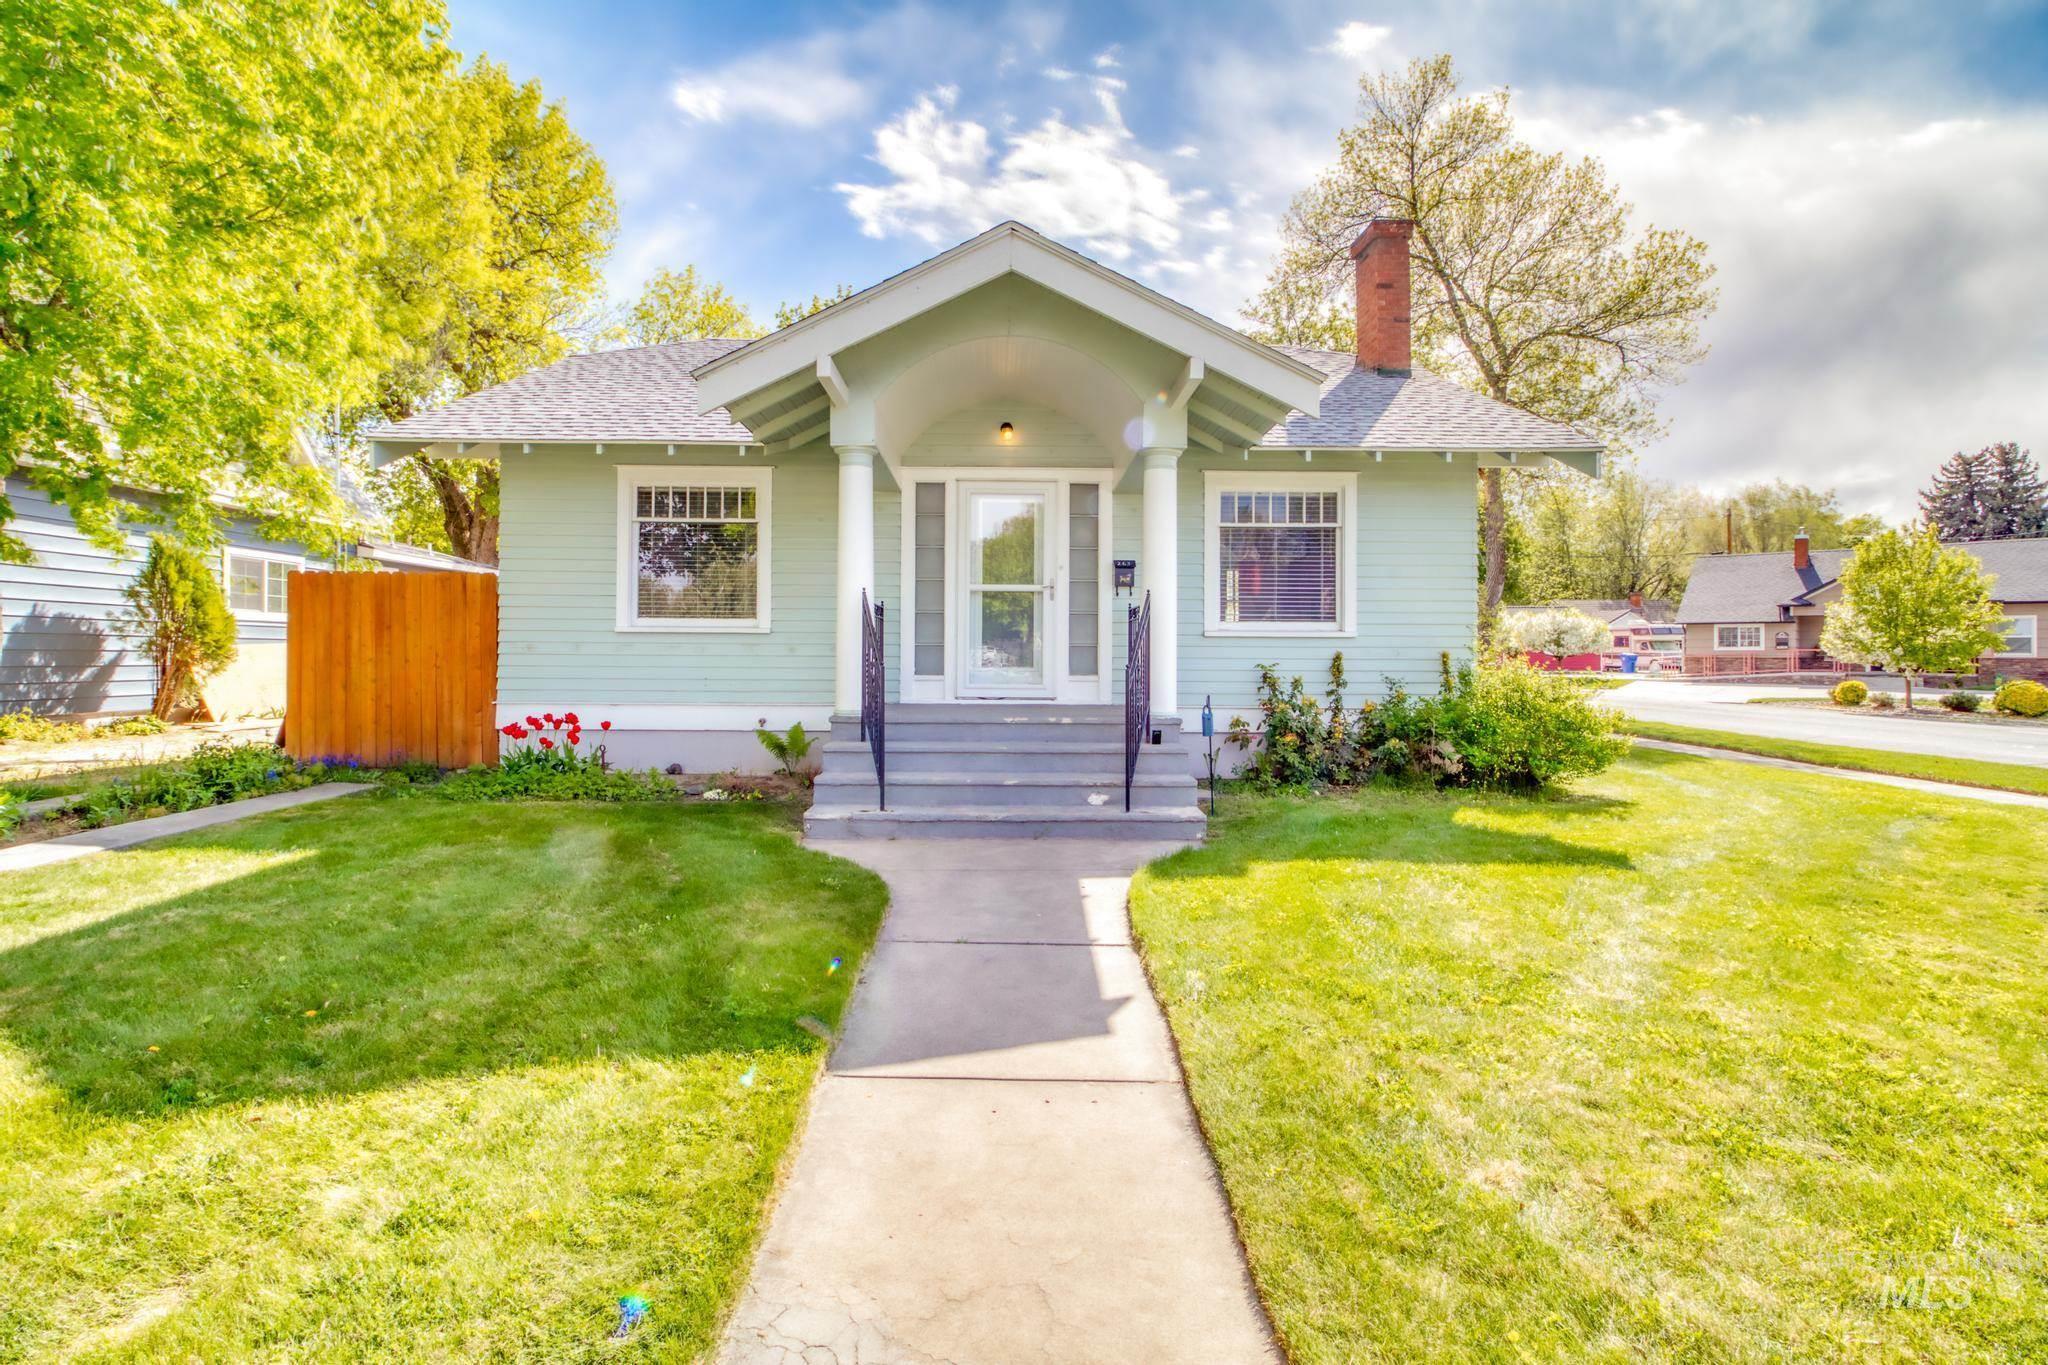 263 9th Avenue N Property Photo - Twin Falls, ID real estate listing